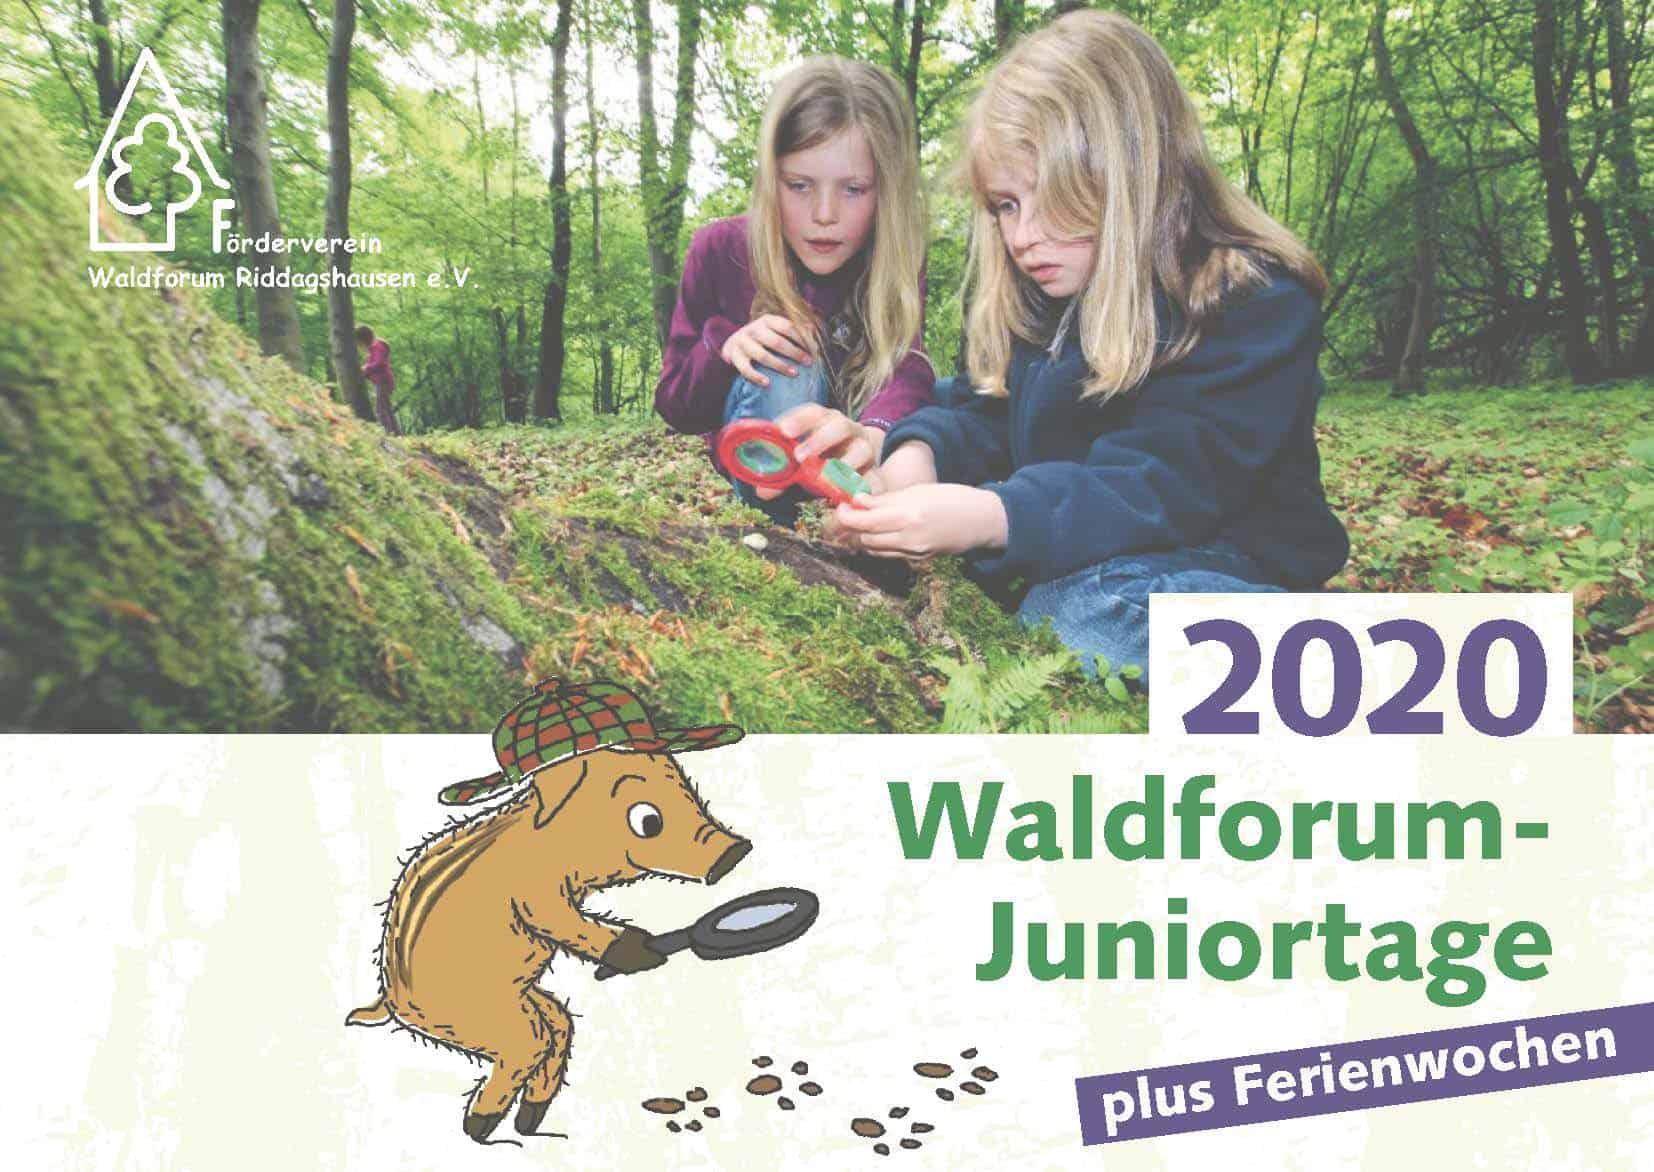 2020-waldforum-juniortage.web_seite_01